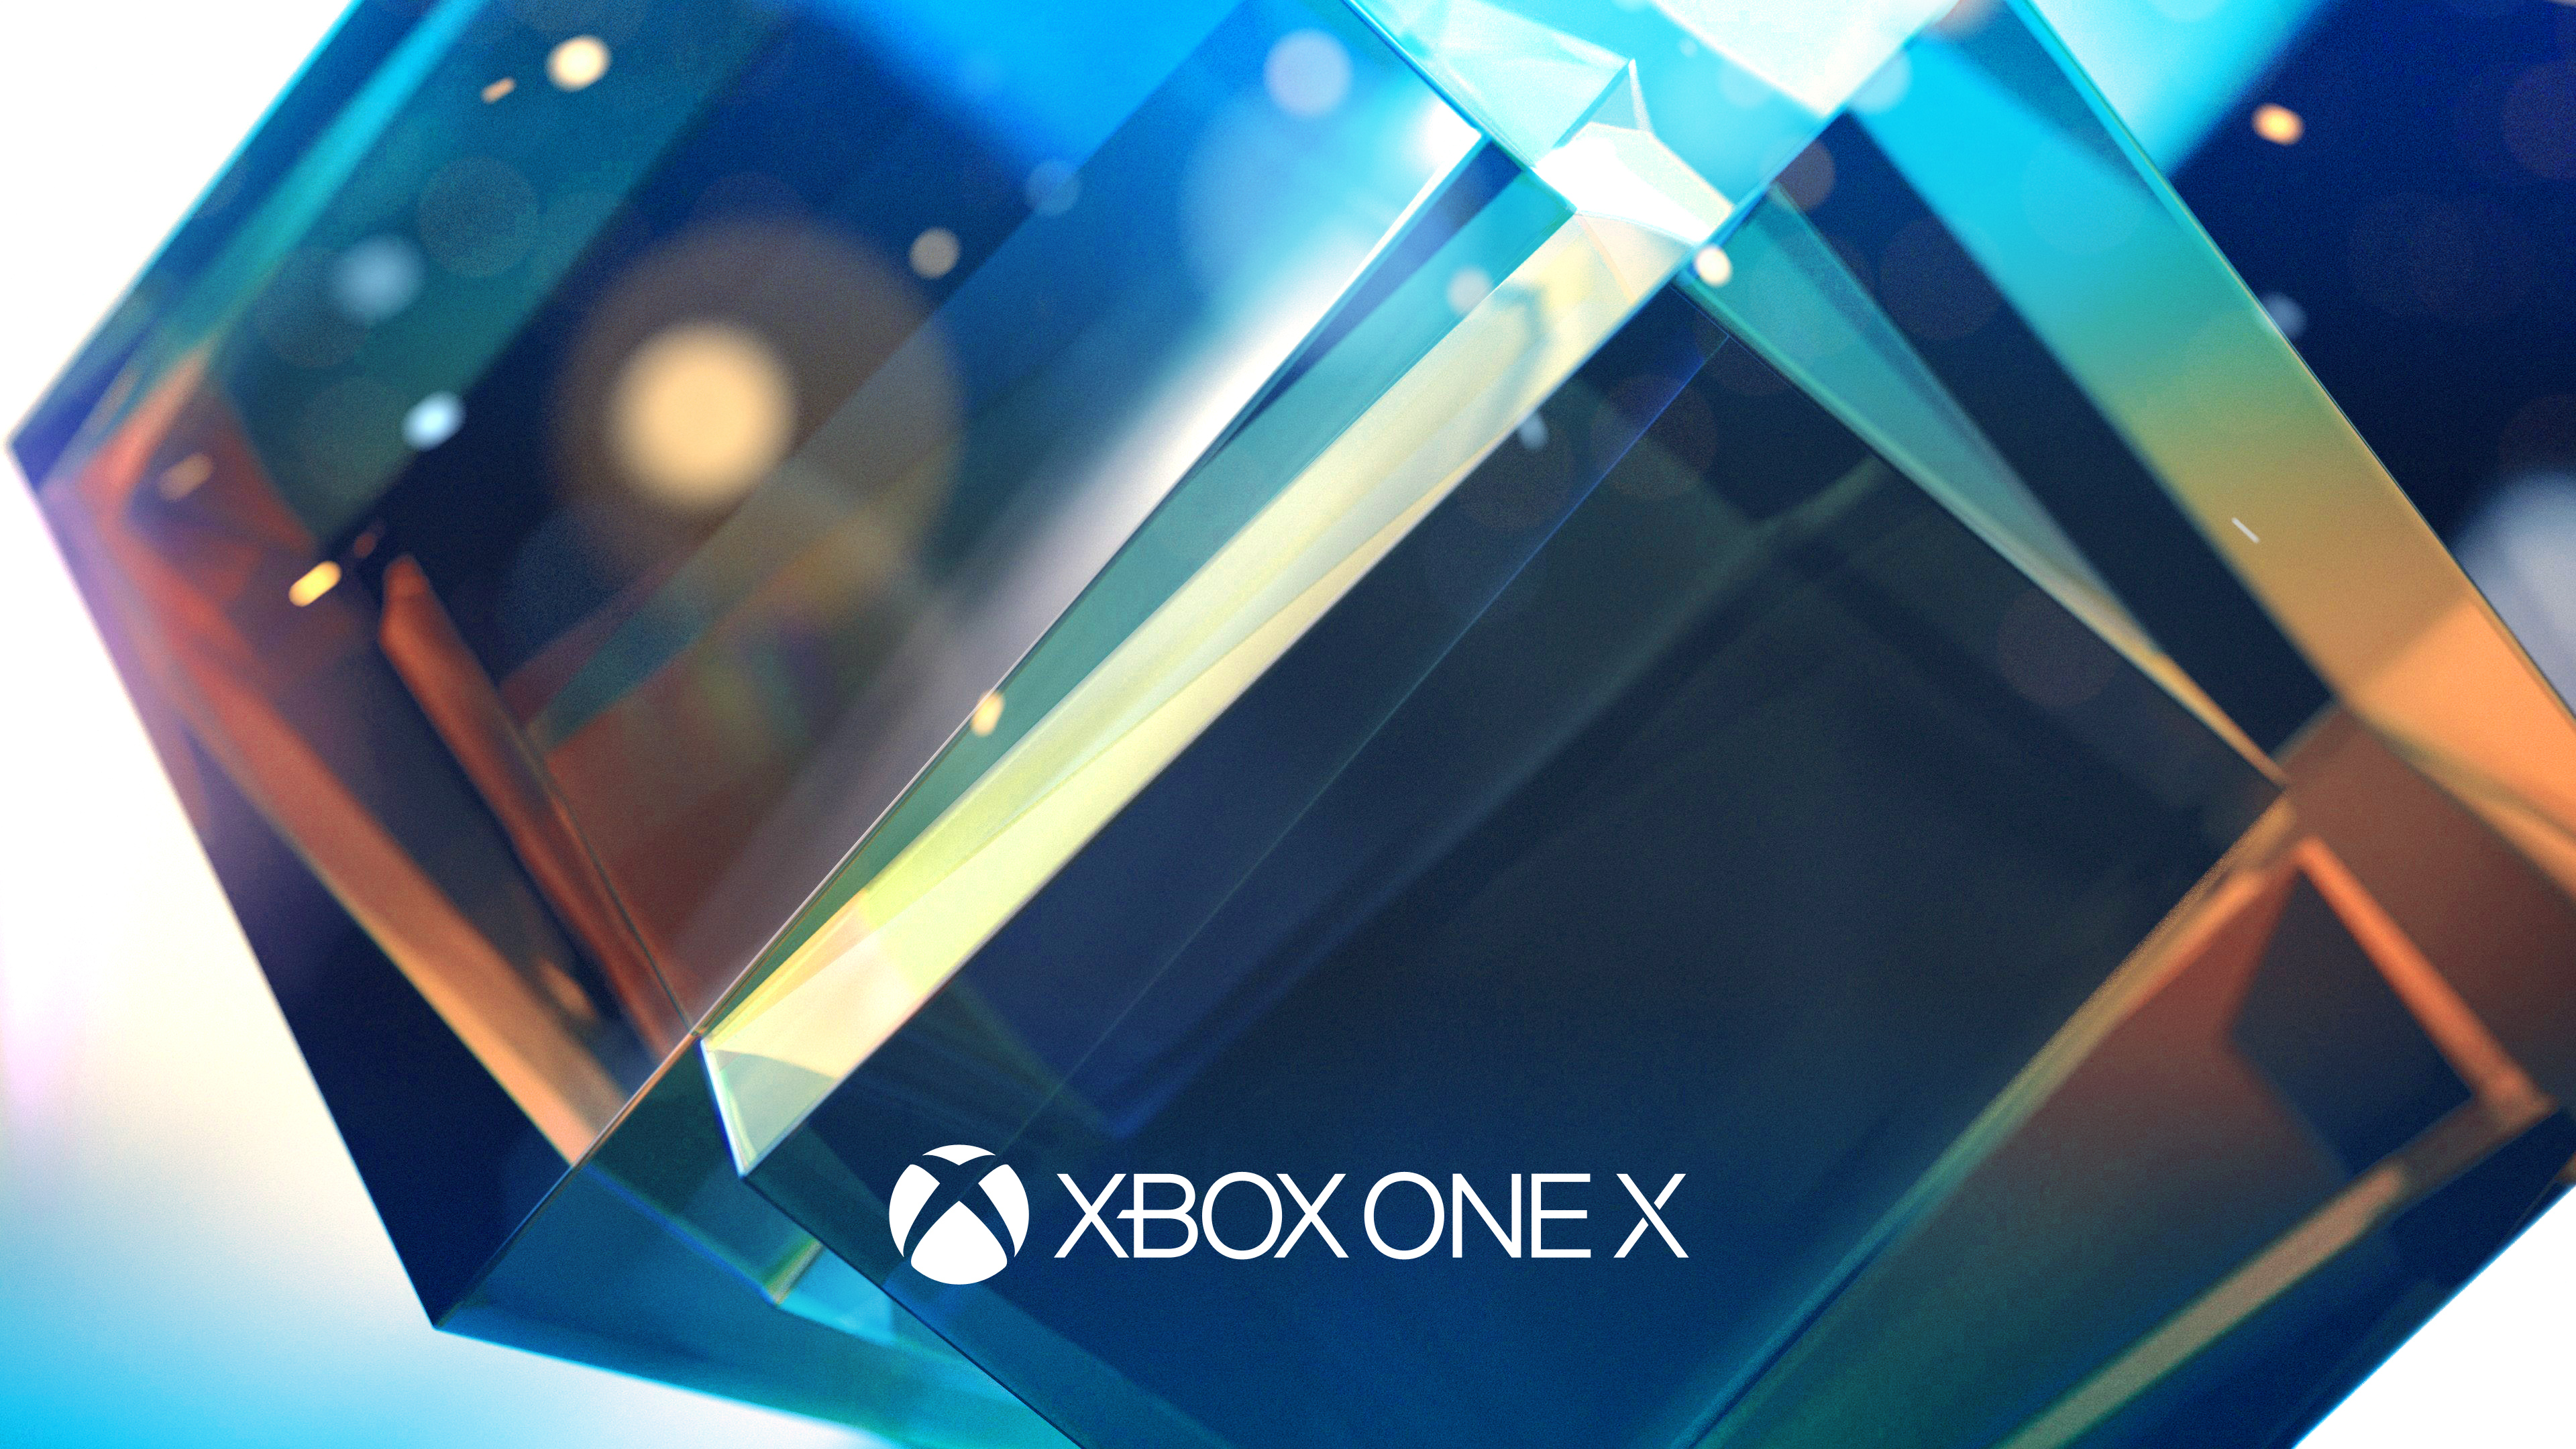 Xbox один х Е3. обои скачать